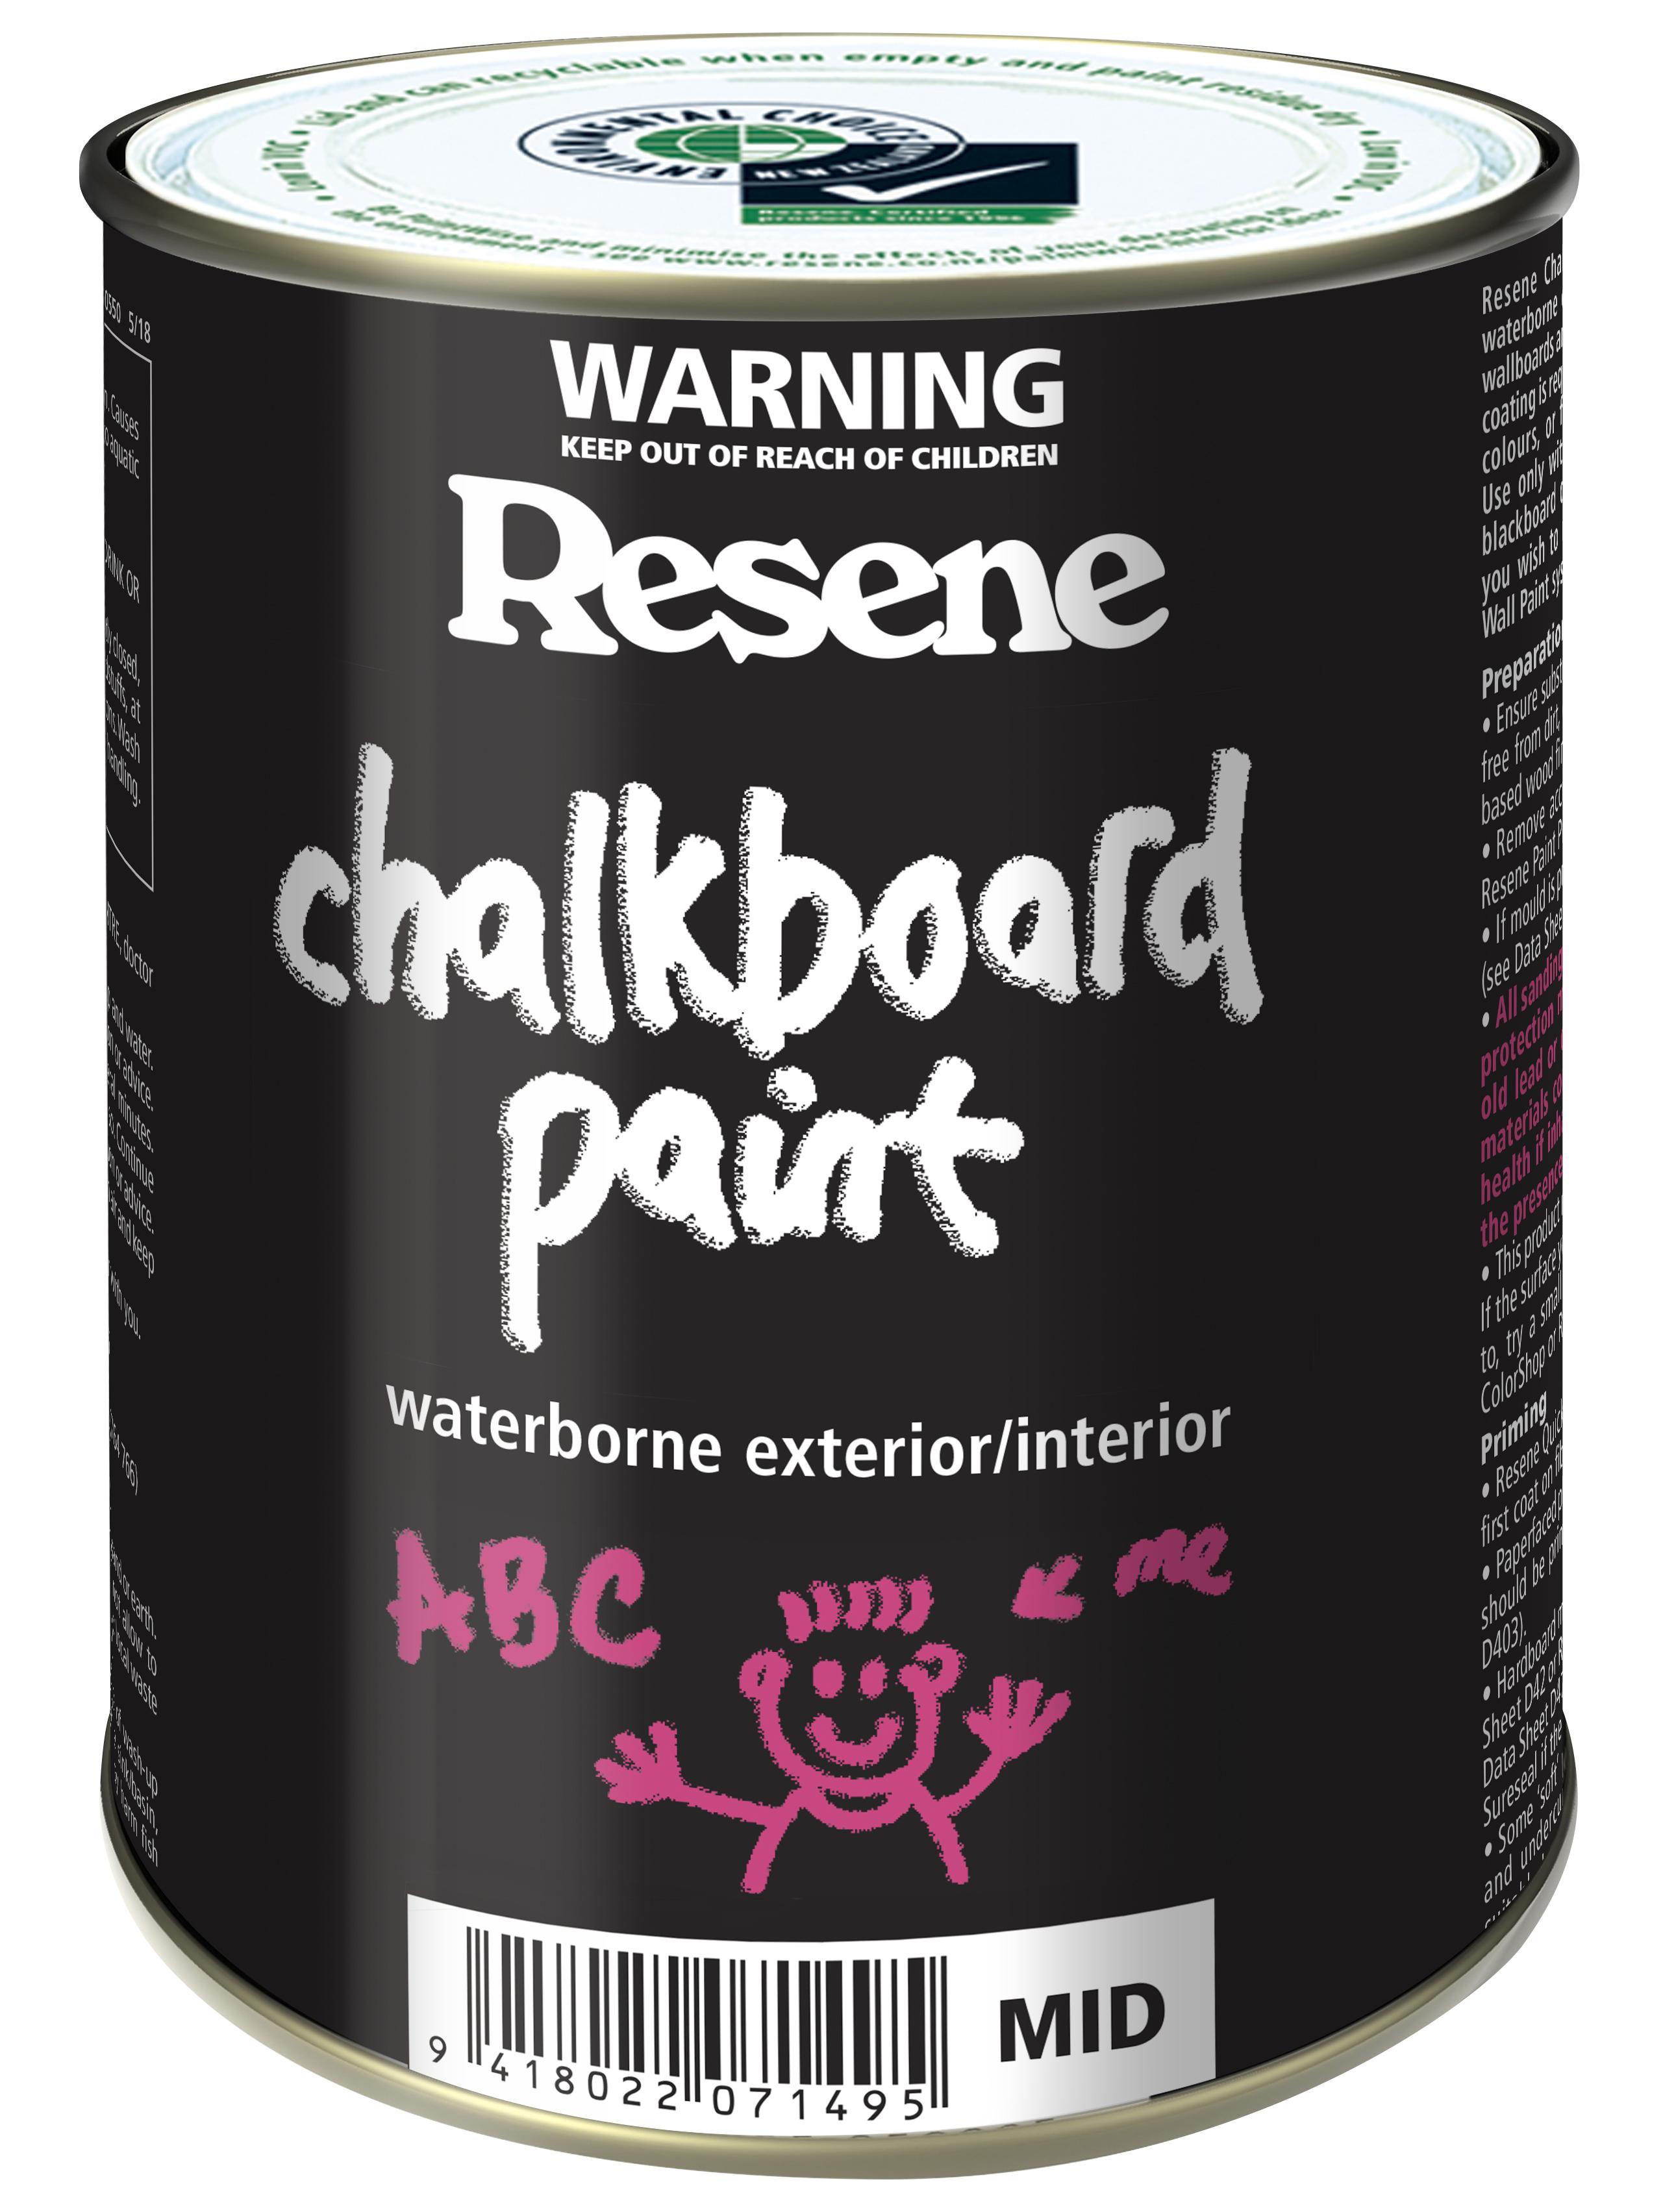 resene chalkboard paint product shot cmyk and rgb downloads